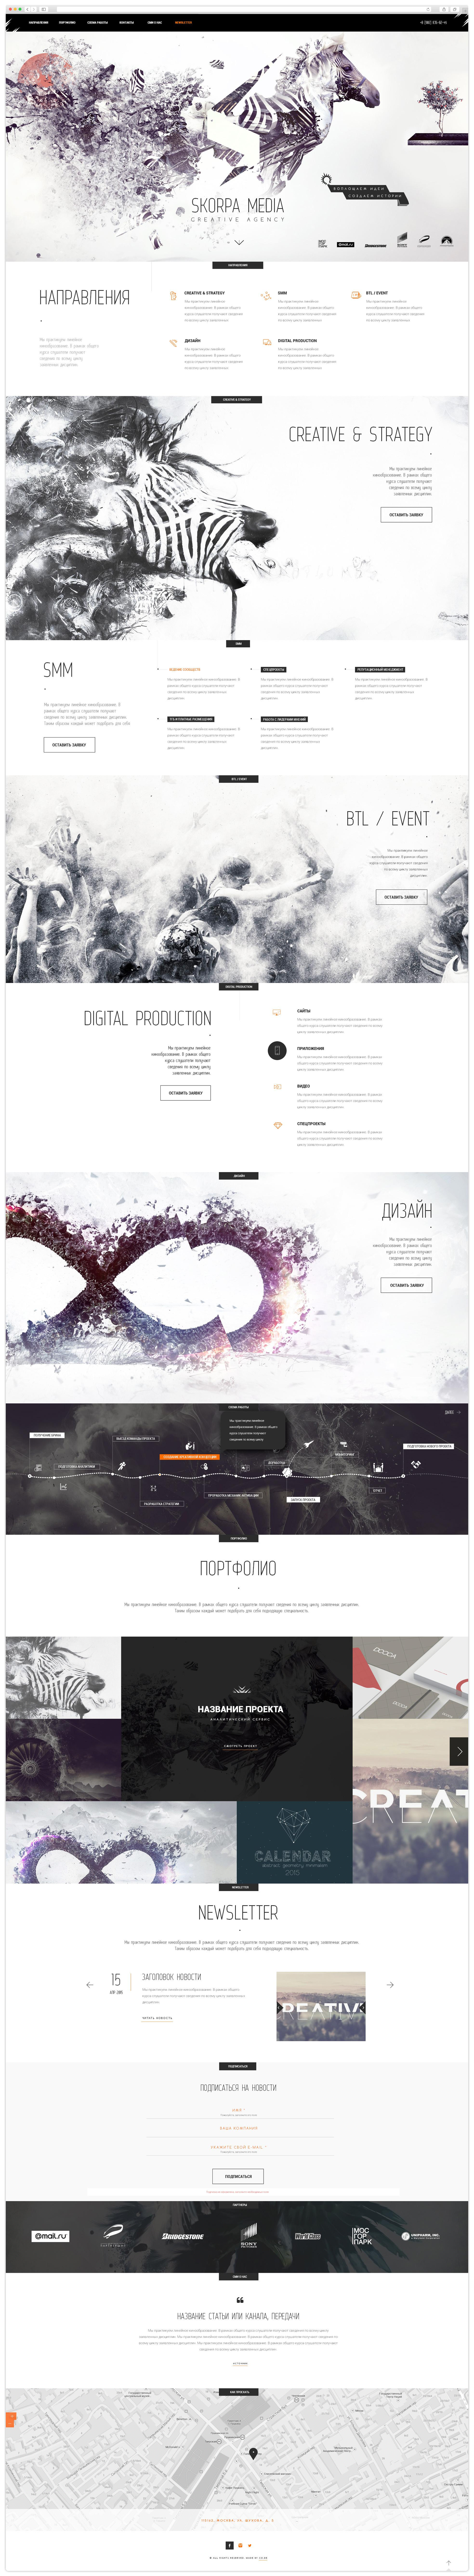 Лэндинг для креативного агенства - Skorpa media